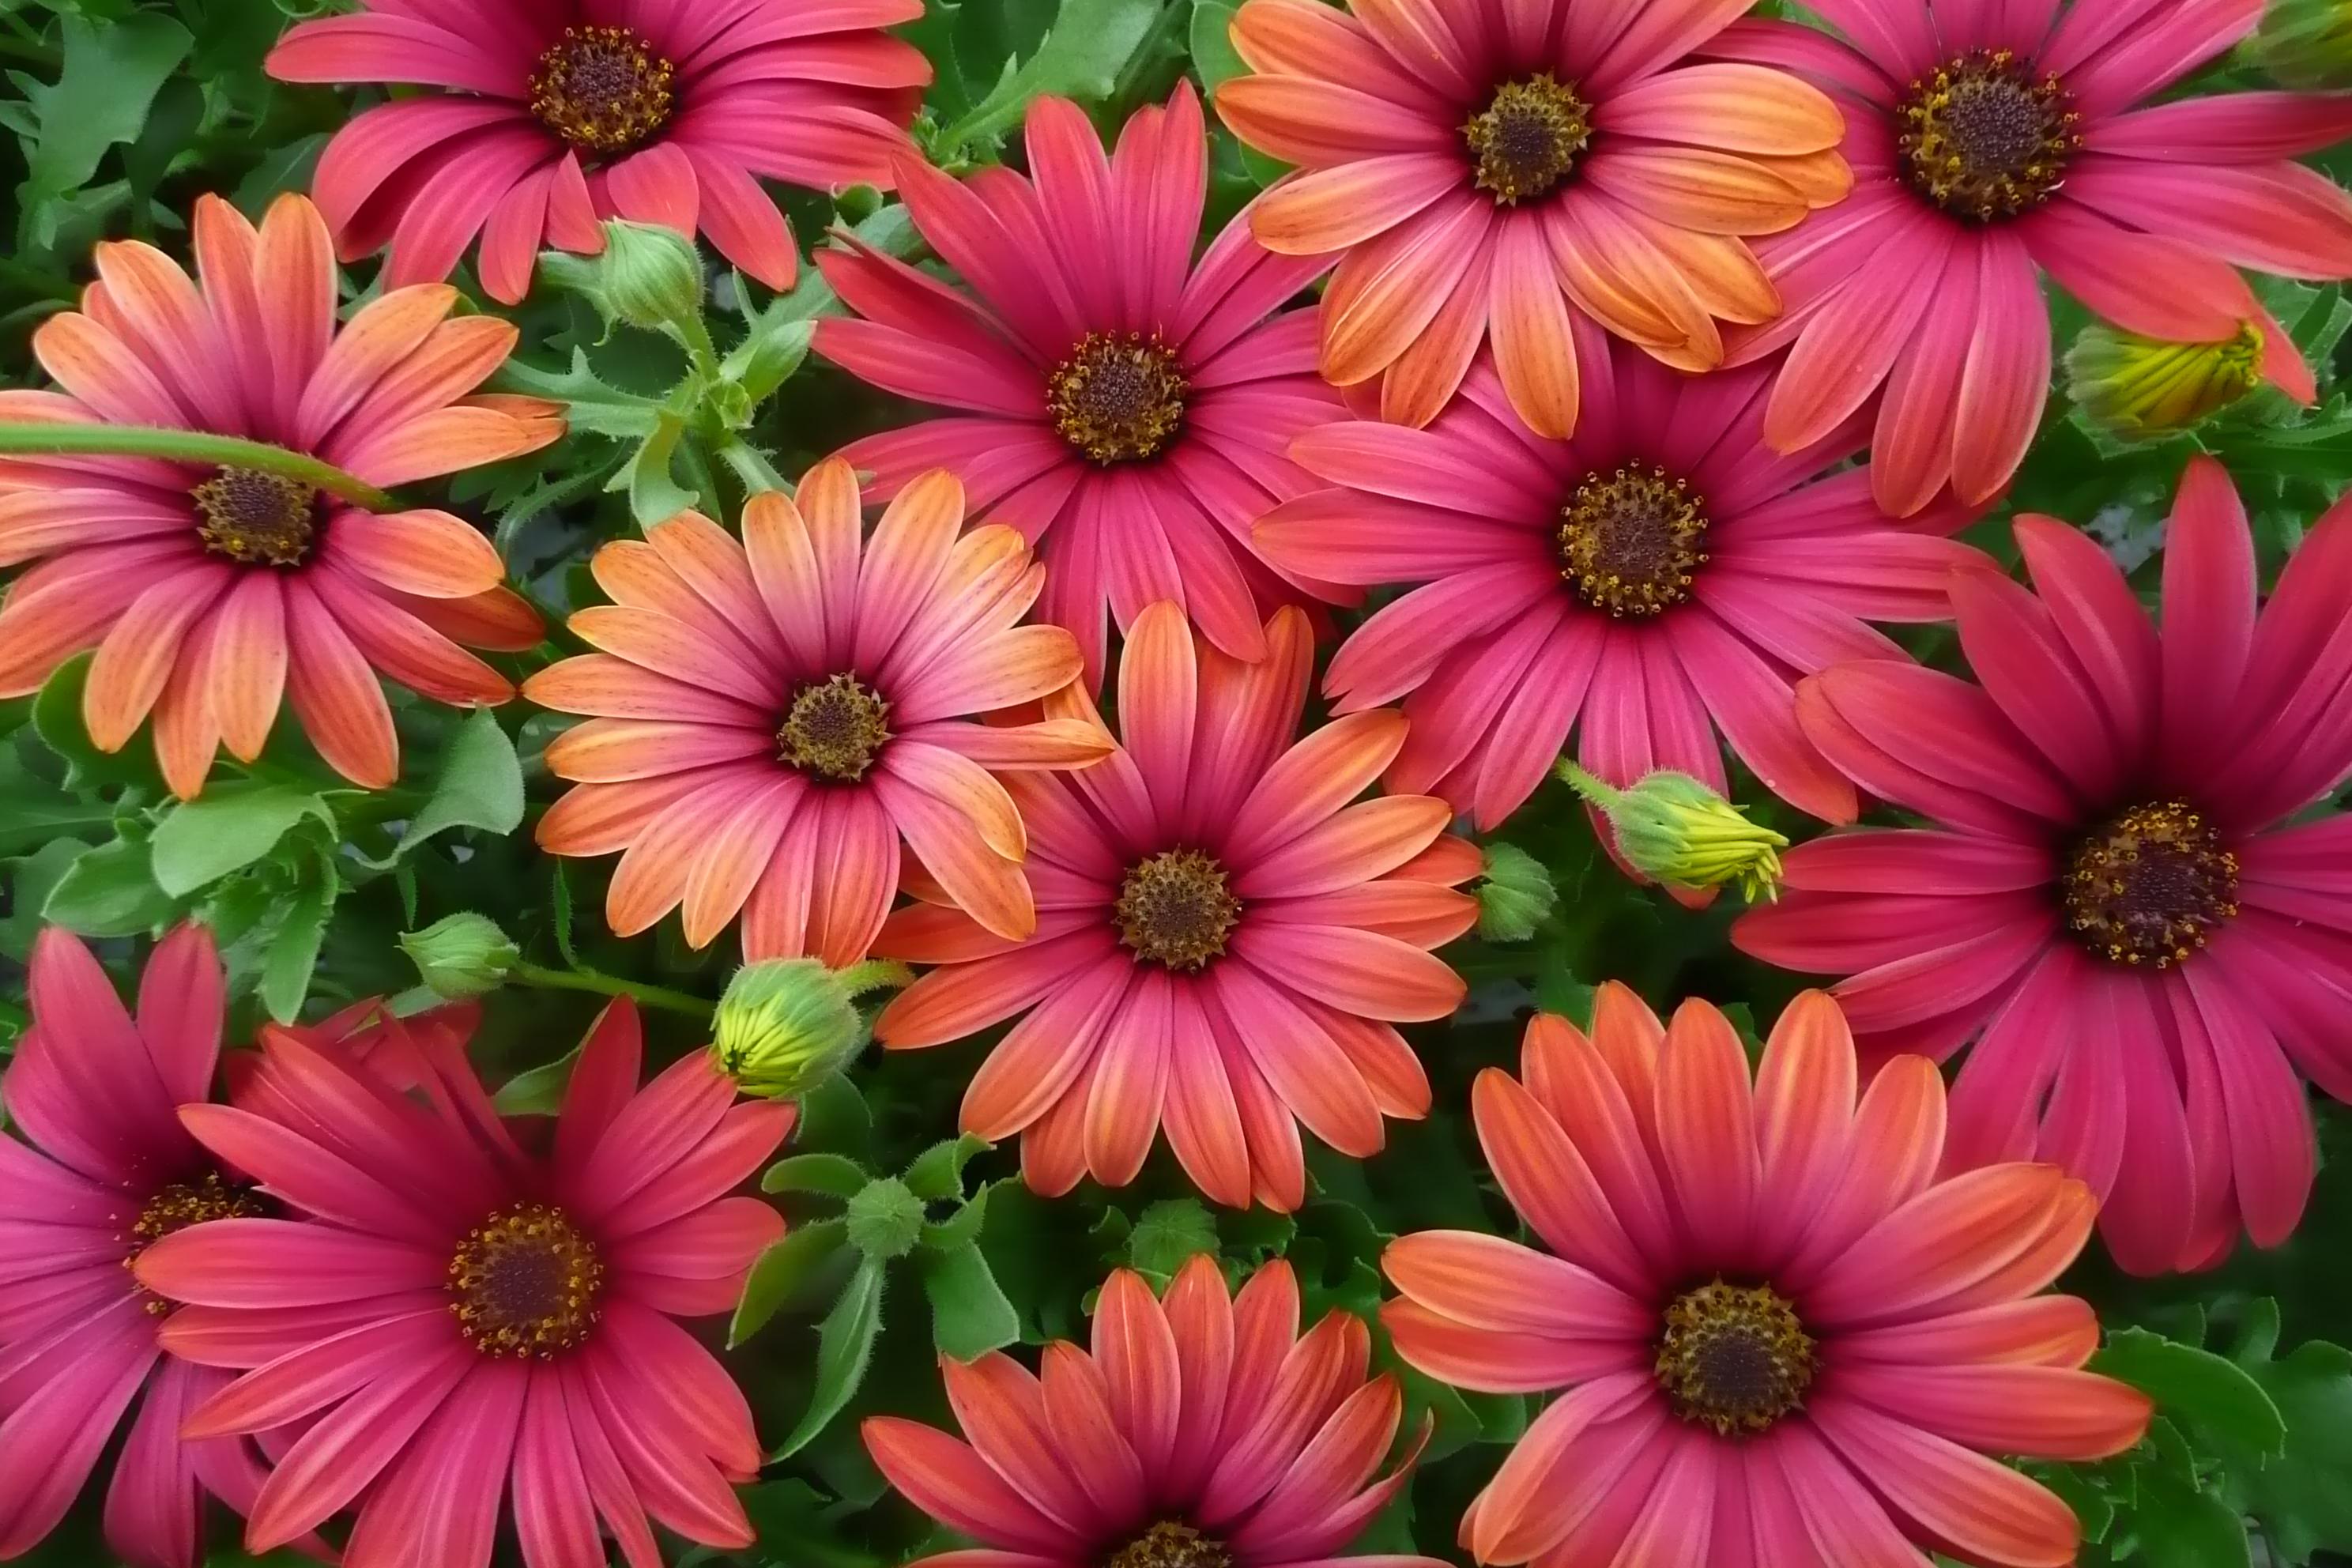 Floradania marketing pflanzen Where did daisies originate